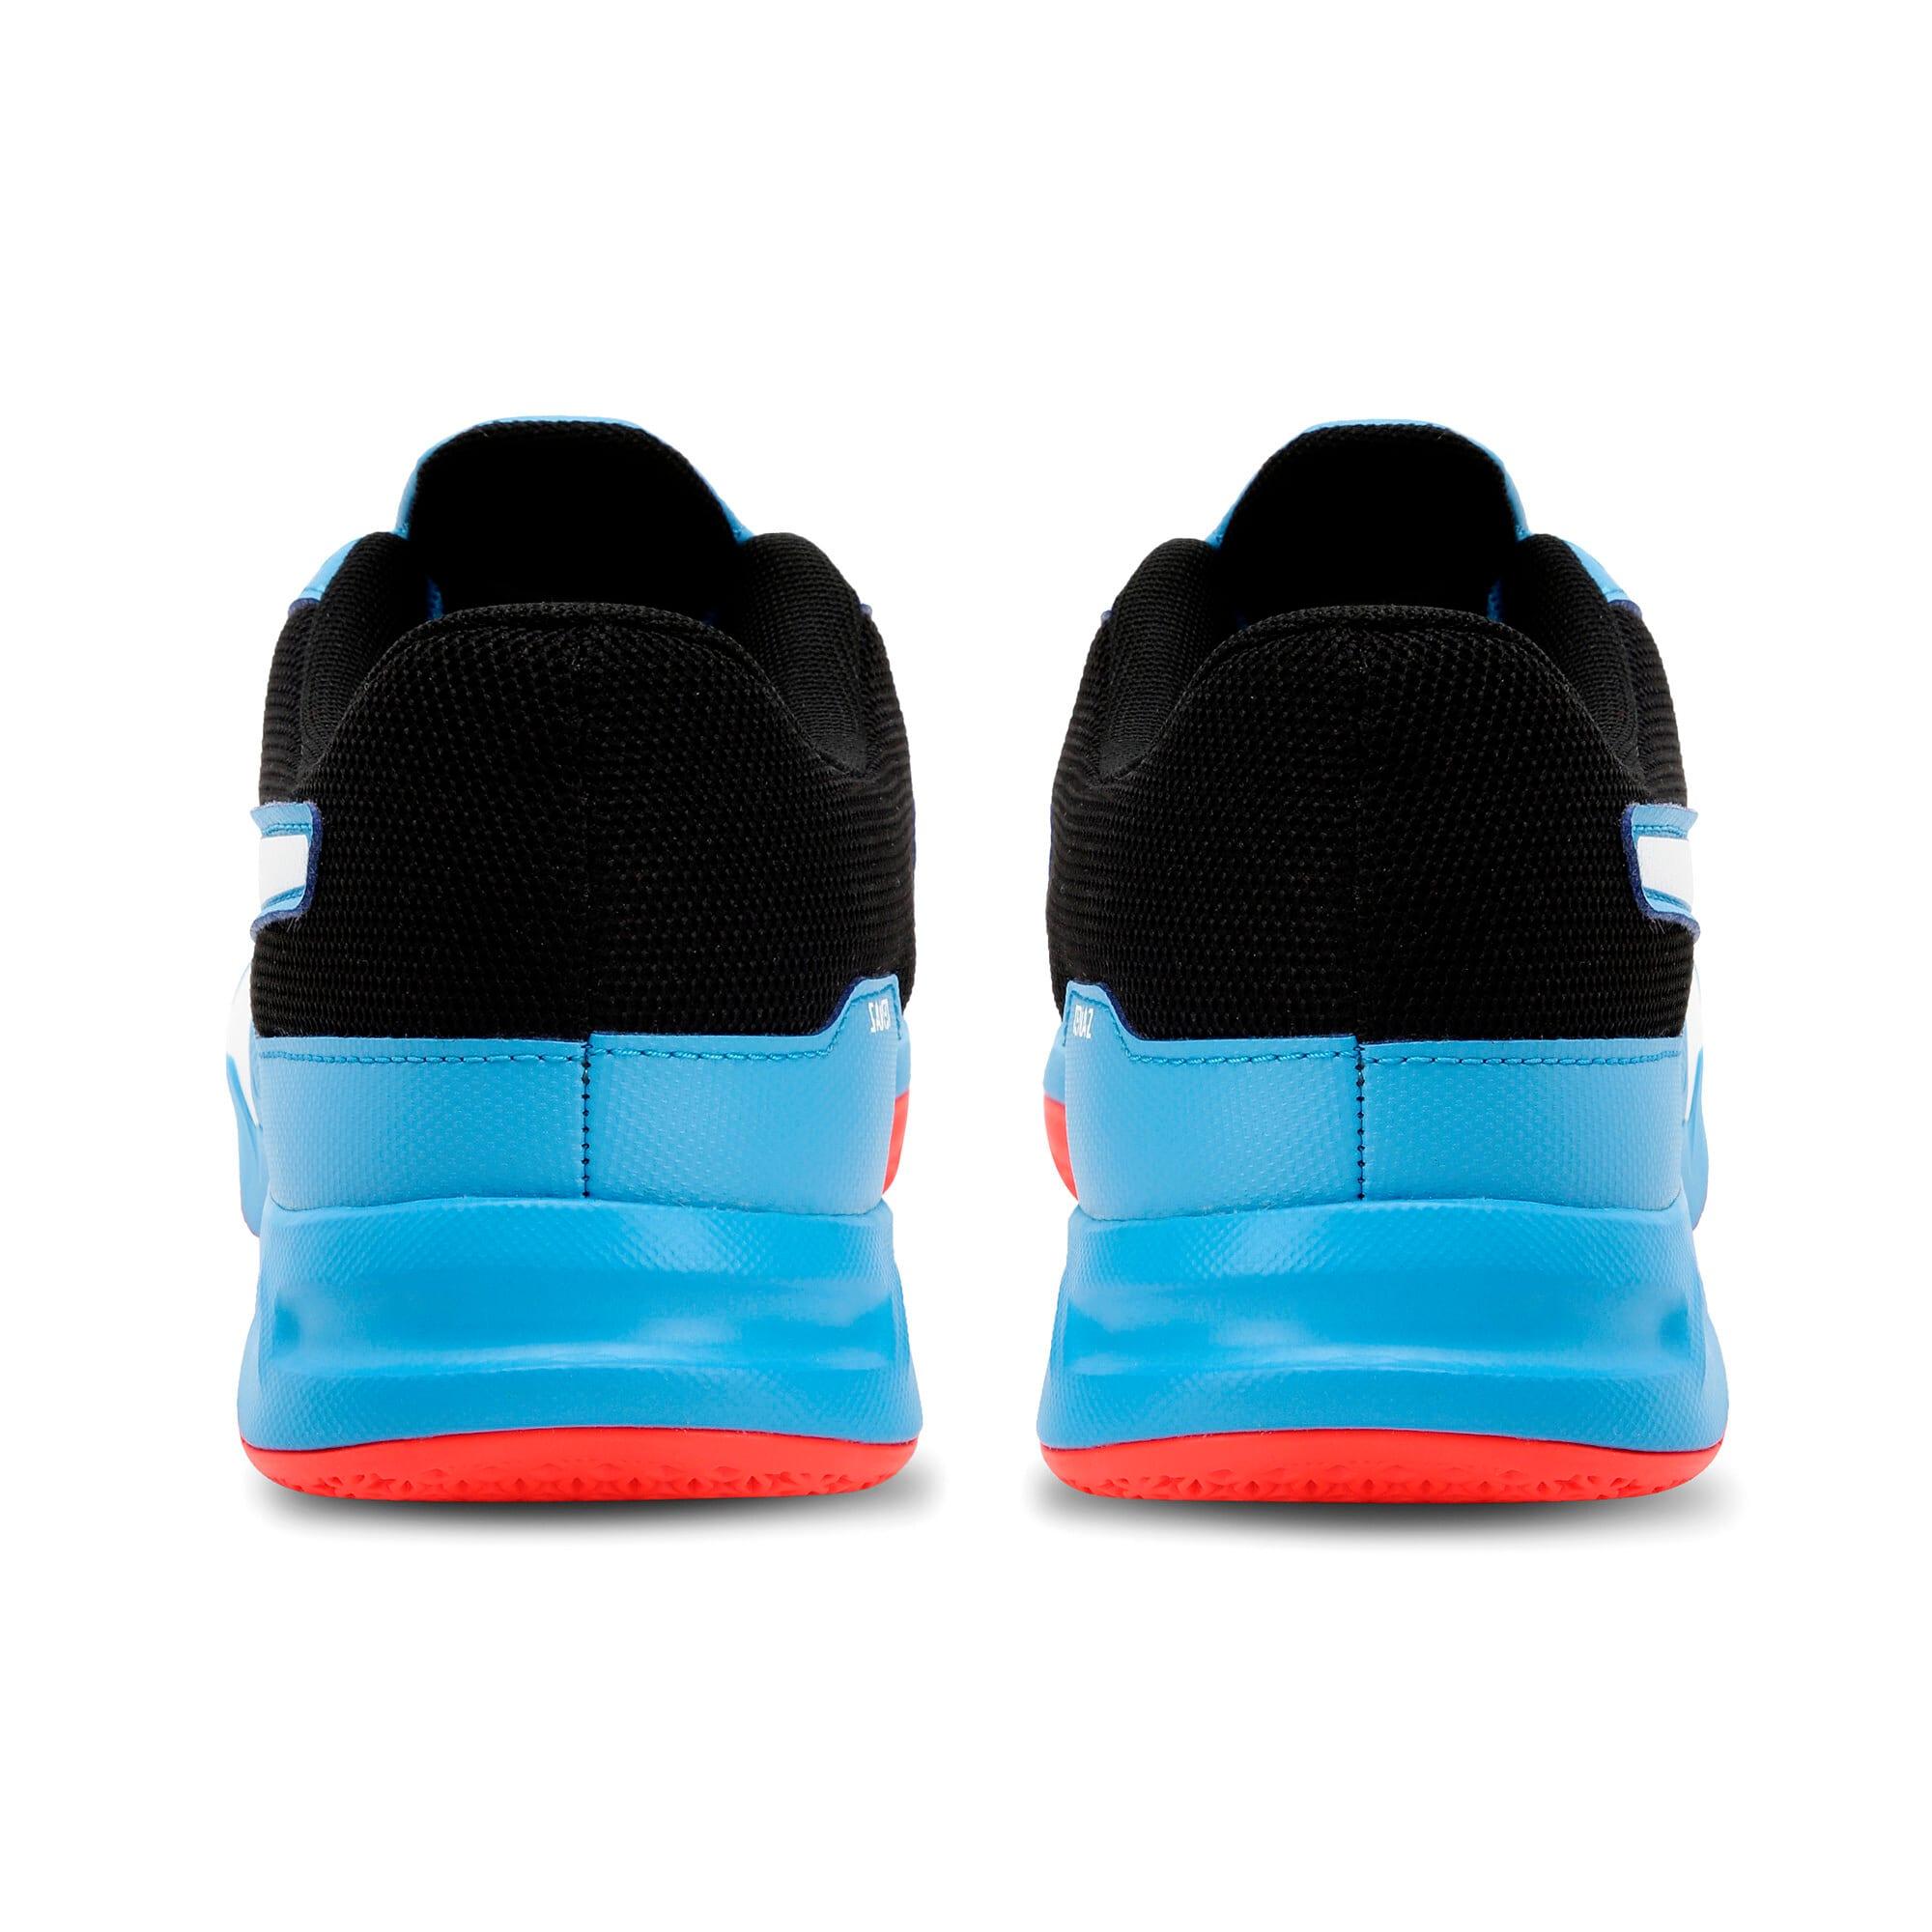 Thumbnail 3 of Tenaz Kids' Indoor Teamsport Shoes, Bleu Azur-White-Black-Red, medium-IND